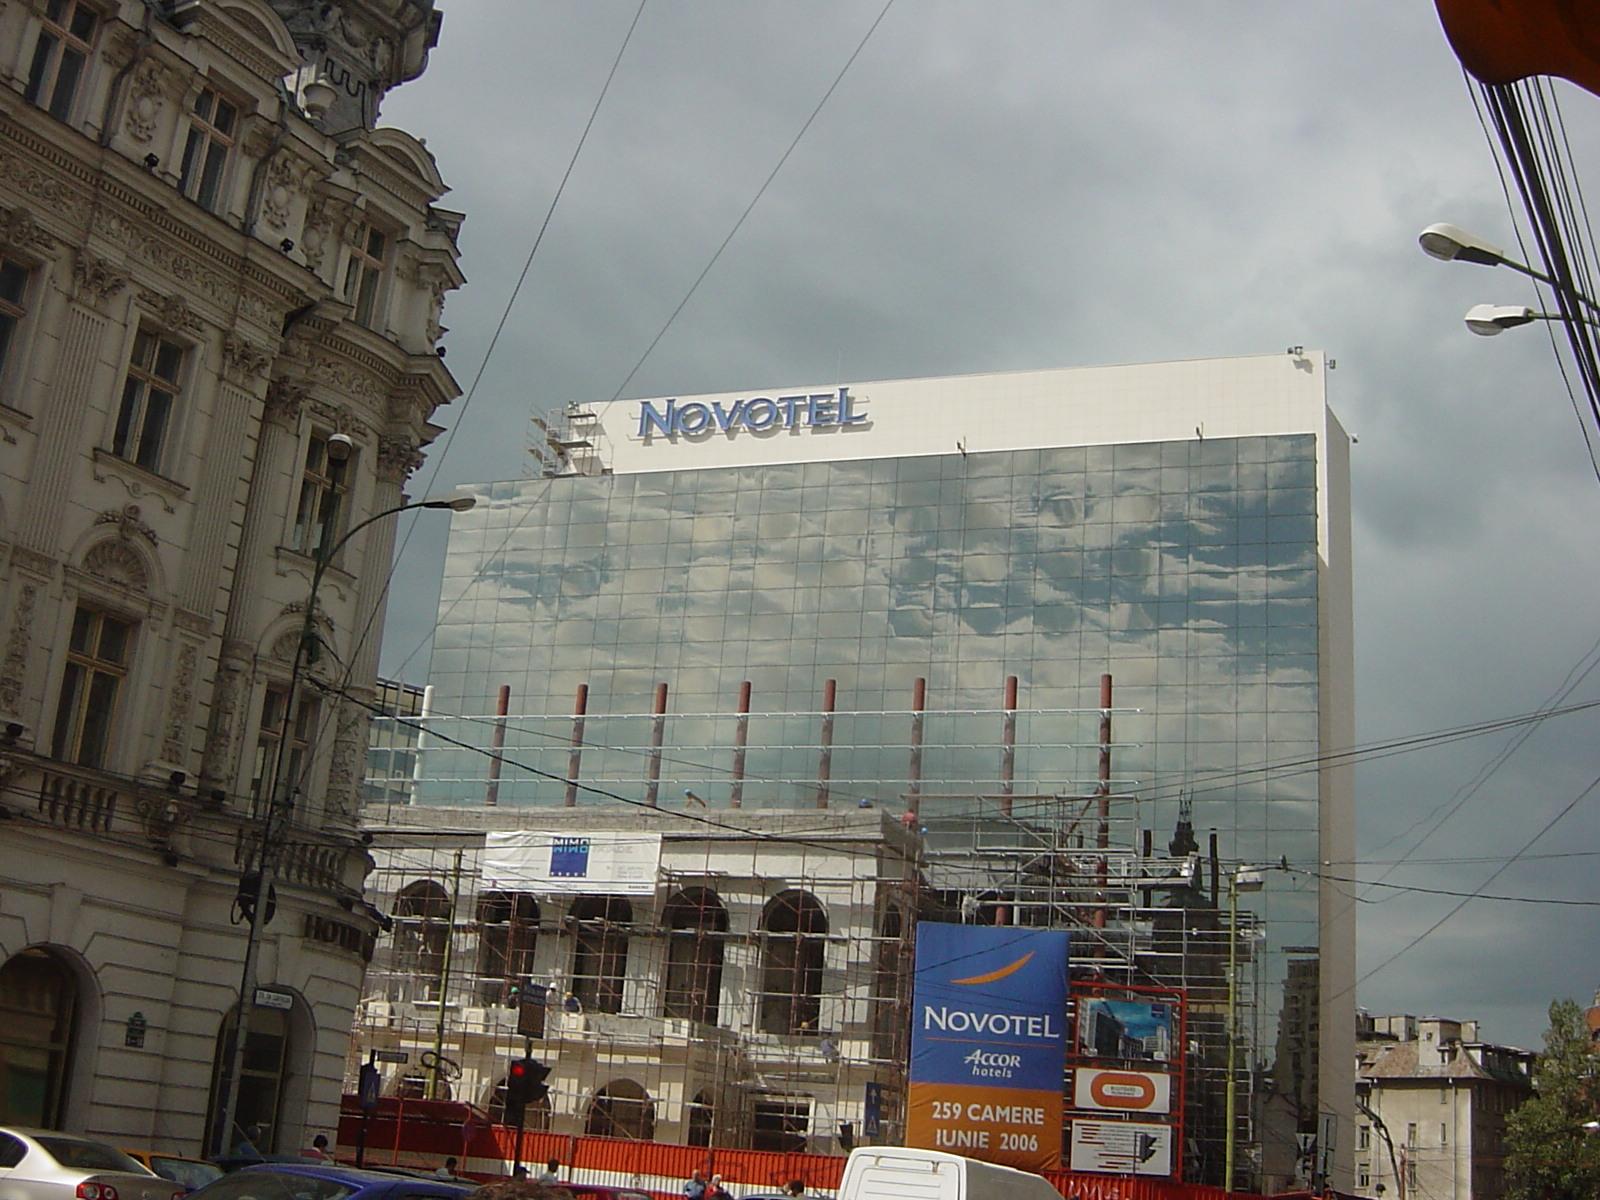 Sistem de iluminare - Hotel Novotel CARALUX - Poza 2